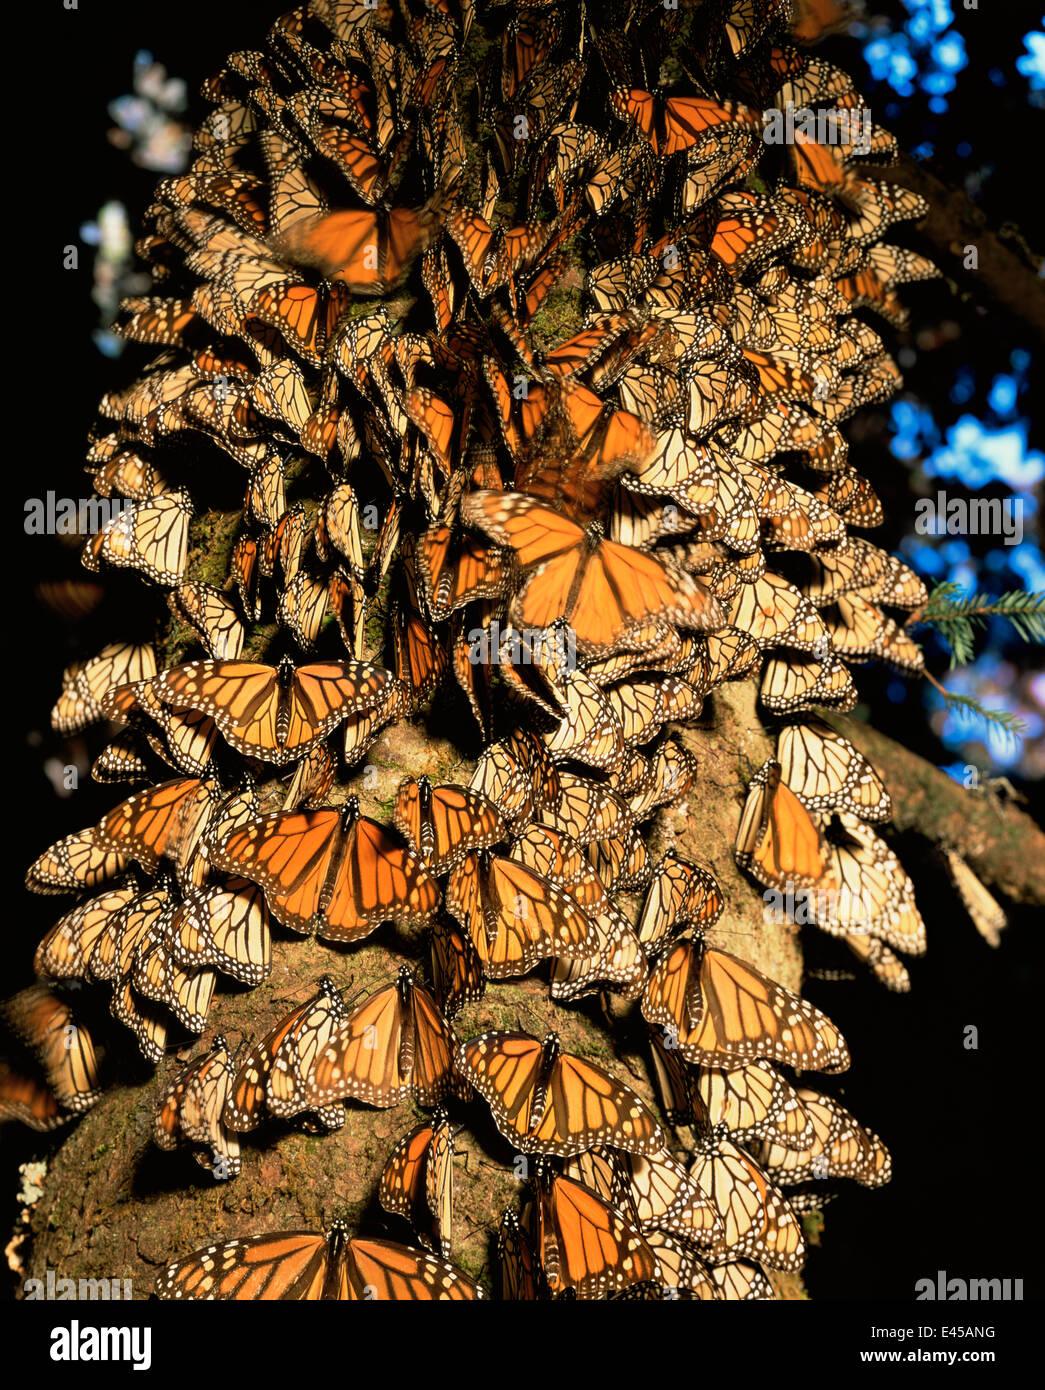 monarch butterflies danaus plexippus covering the trunk of a